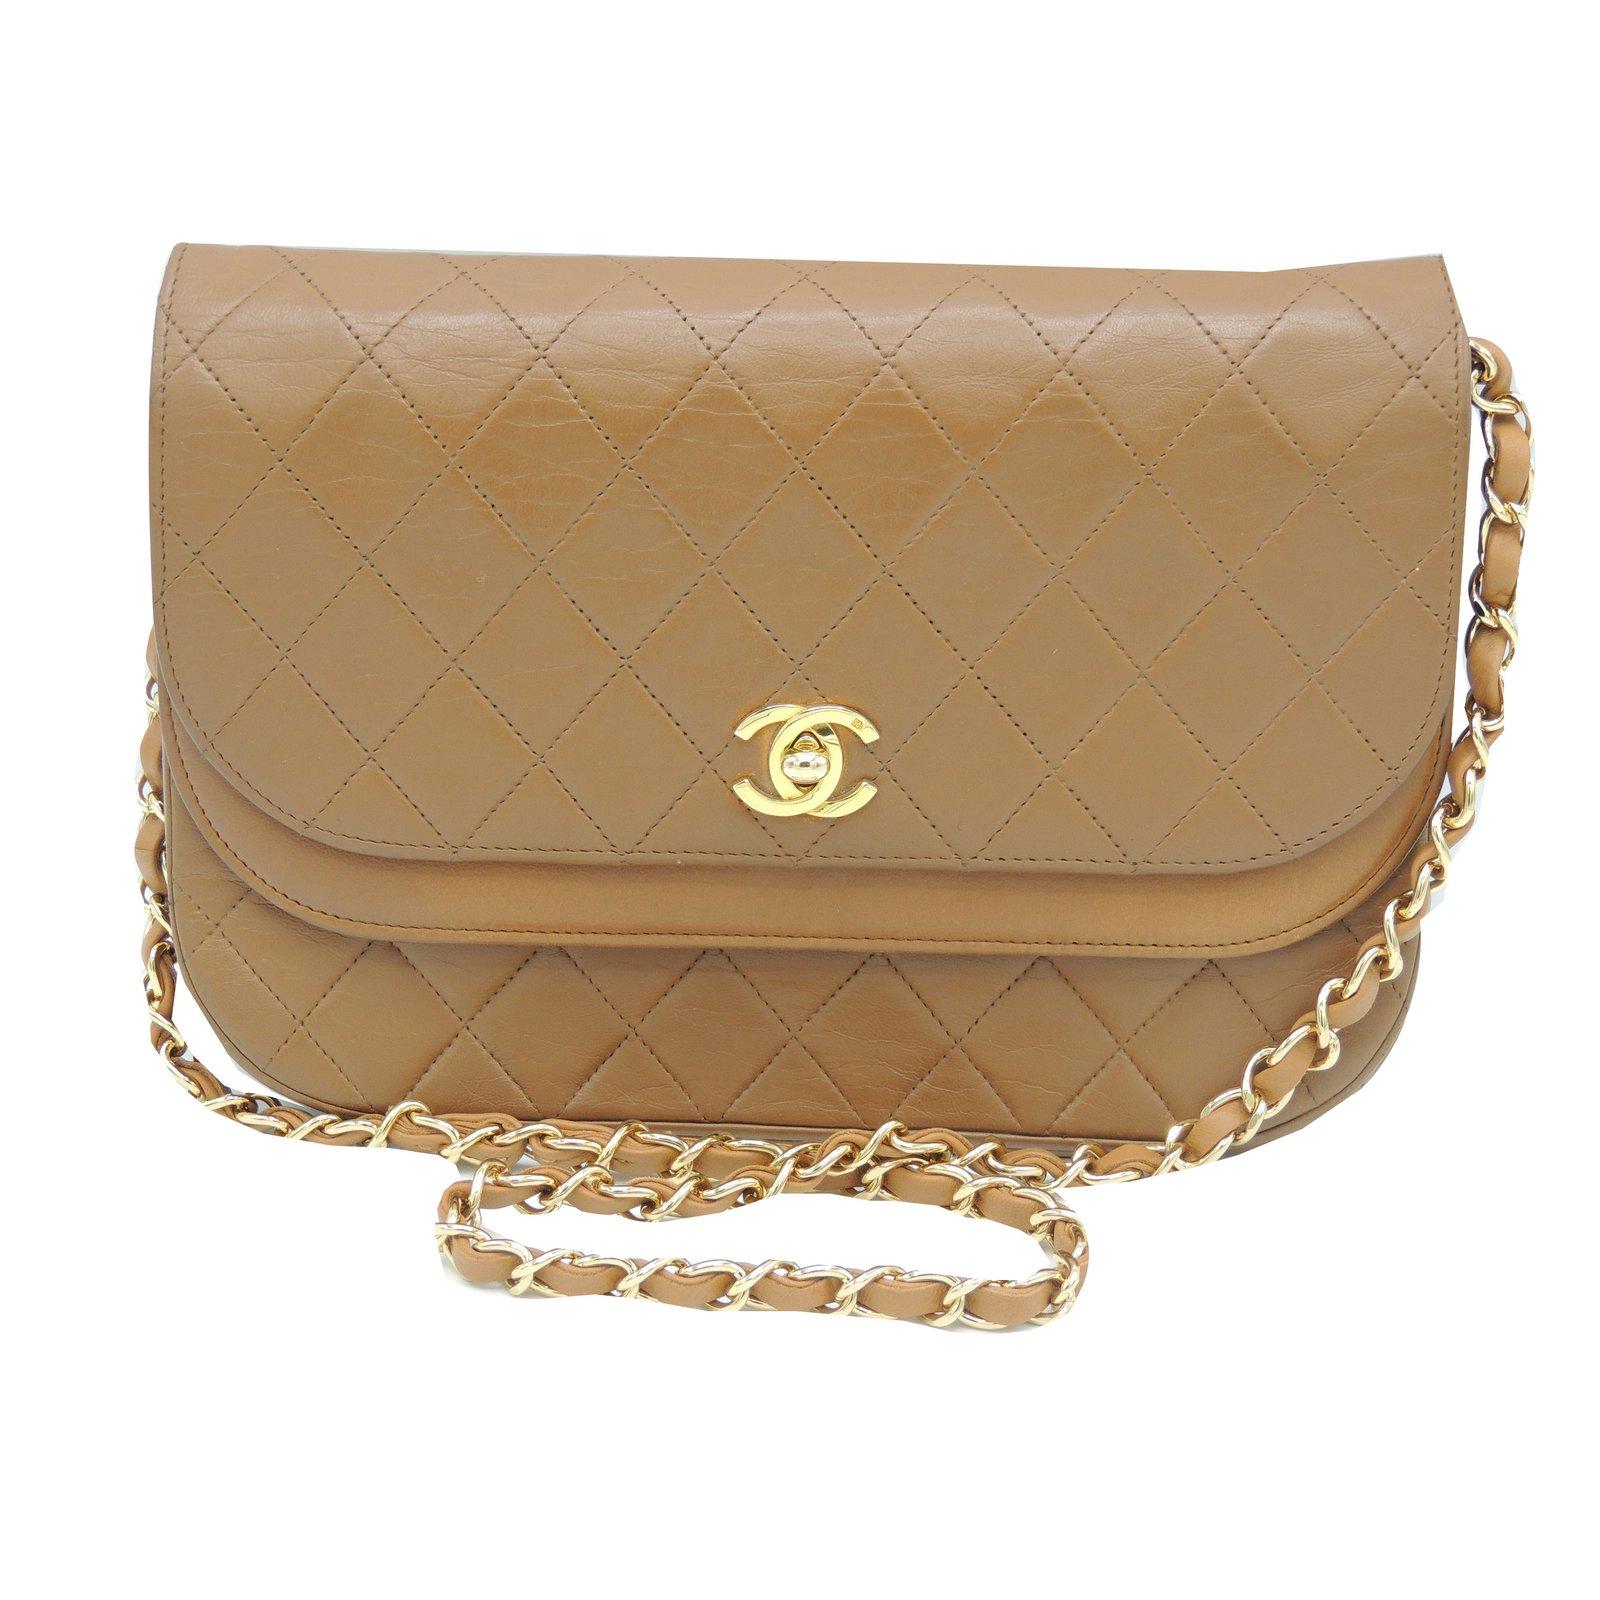 Sacs à main Chanel Agneau matelassé vintage Cuir Caramel ref.67056 ... cc40db4ab06